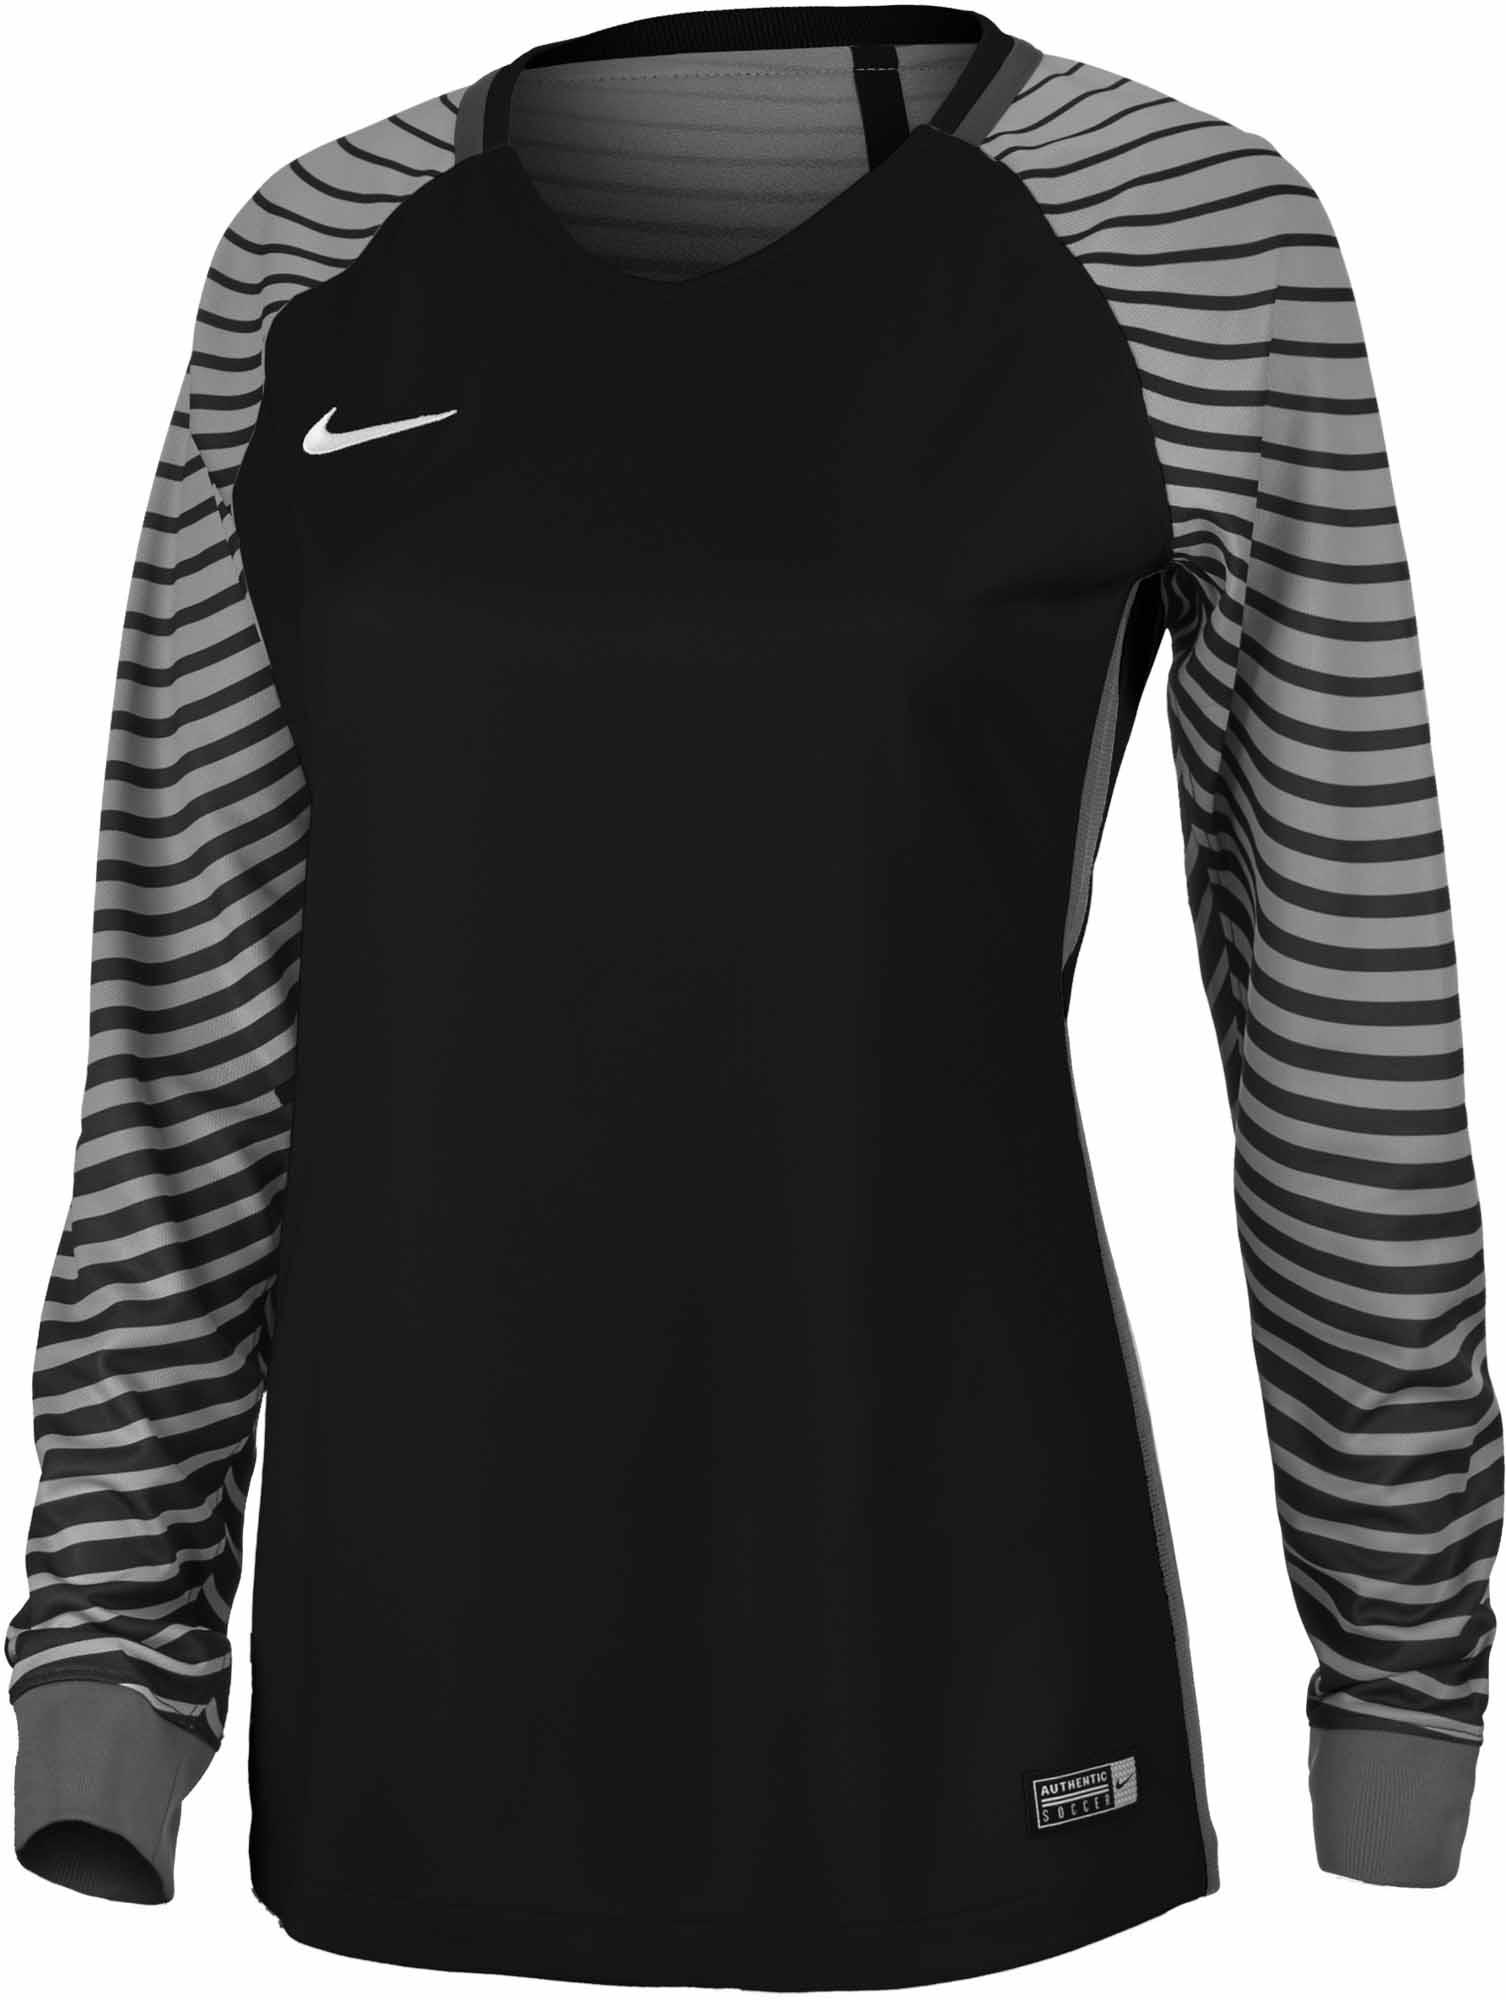 d04d5d4ec Nike Womens Gardien Goalkeeper Jersey - Black   Cool Grey - Soccer ...